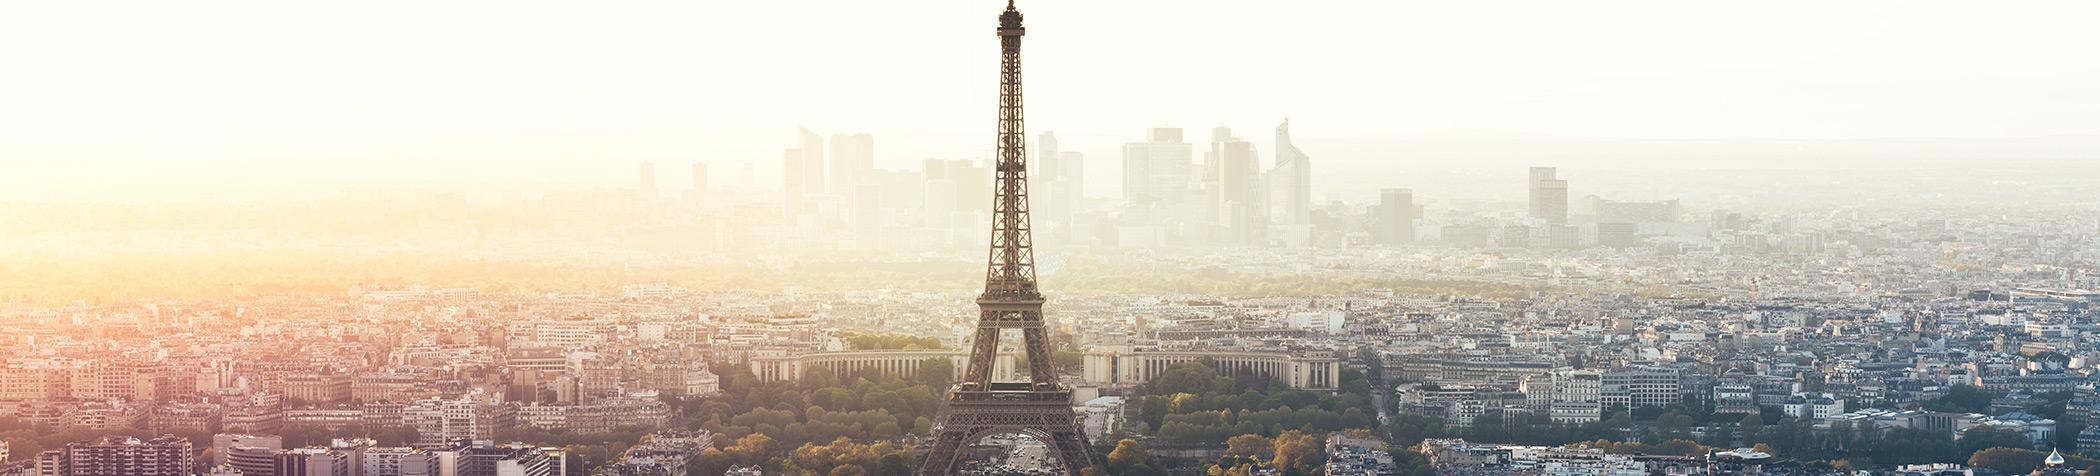 anthrotech-blog-paris-france